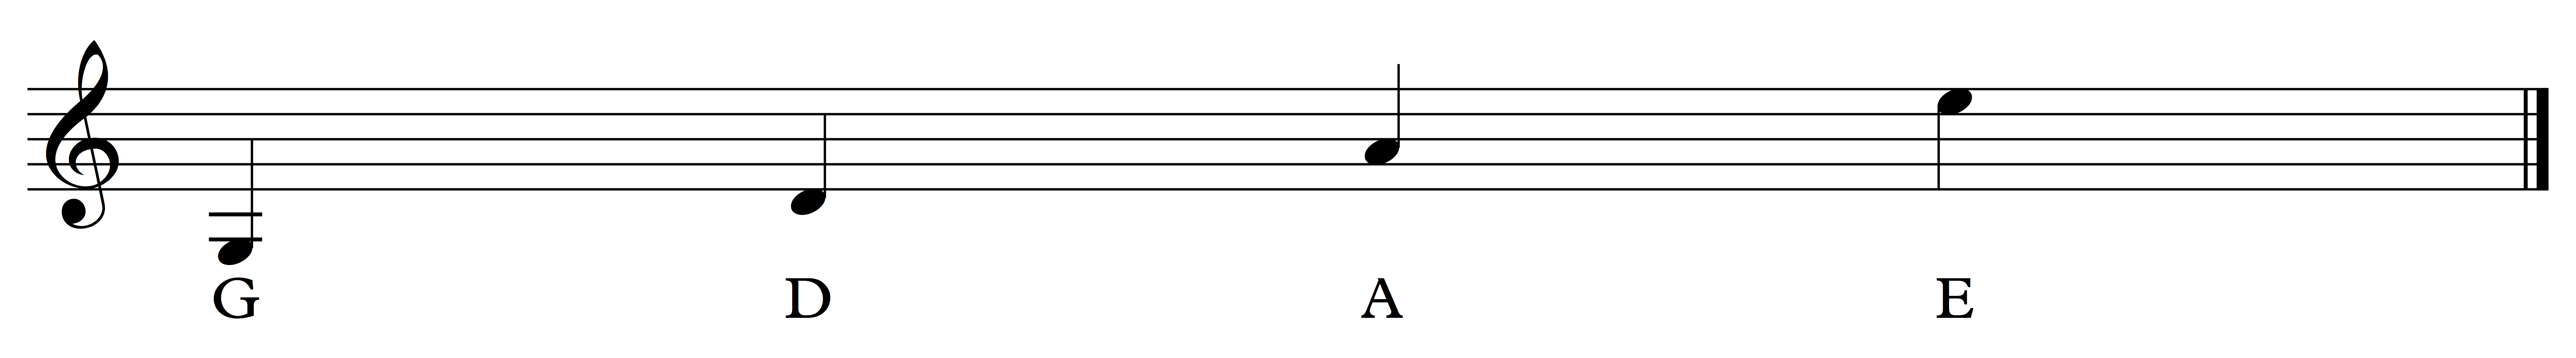 Open String Notes_web